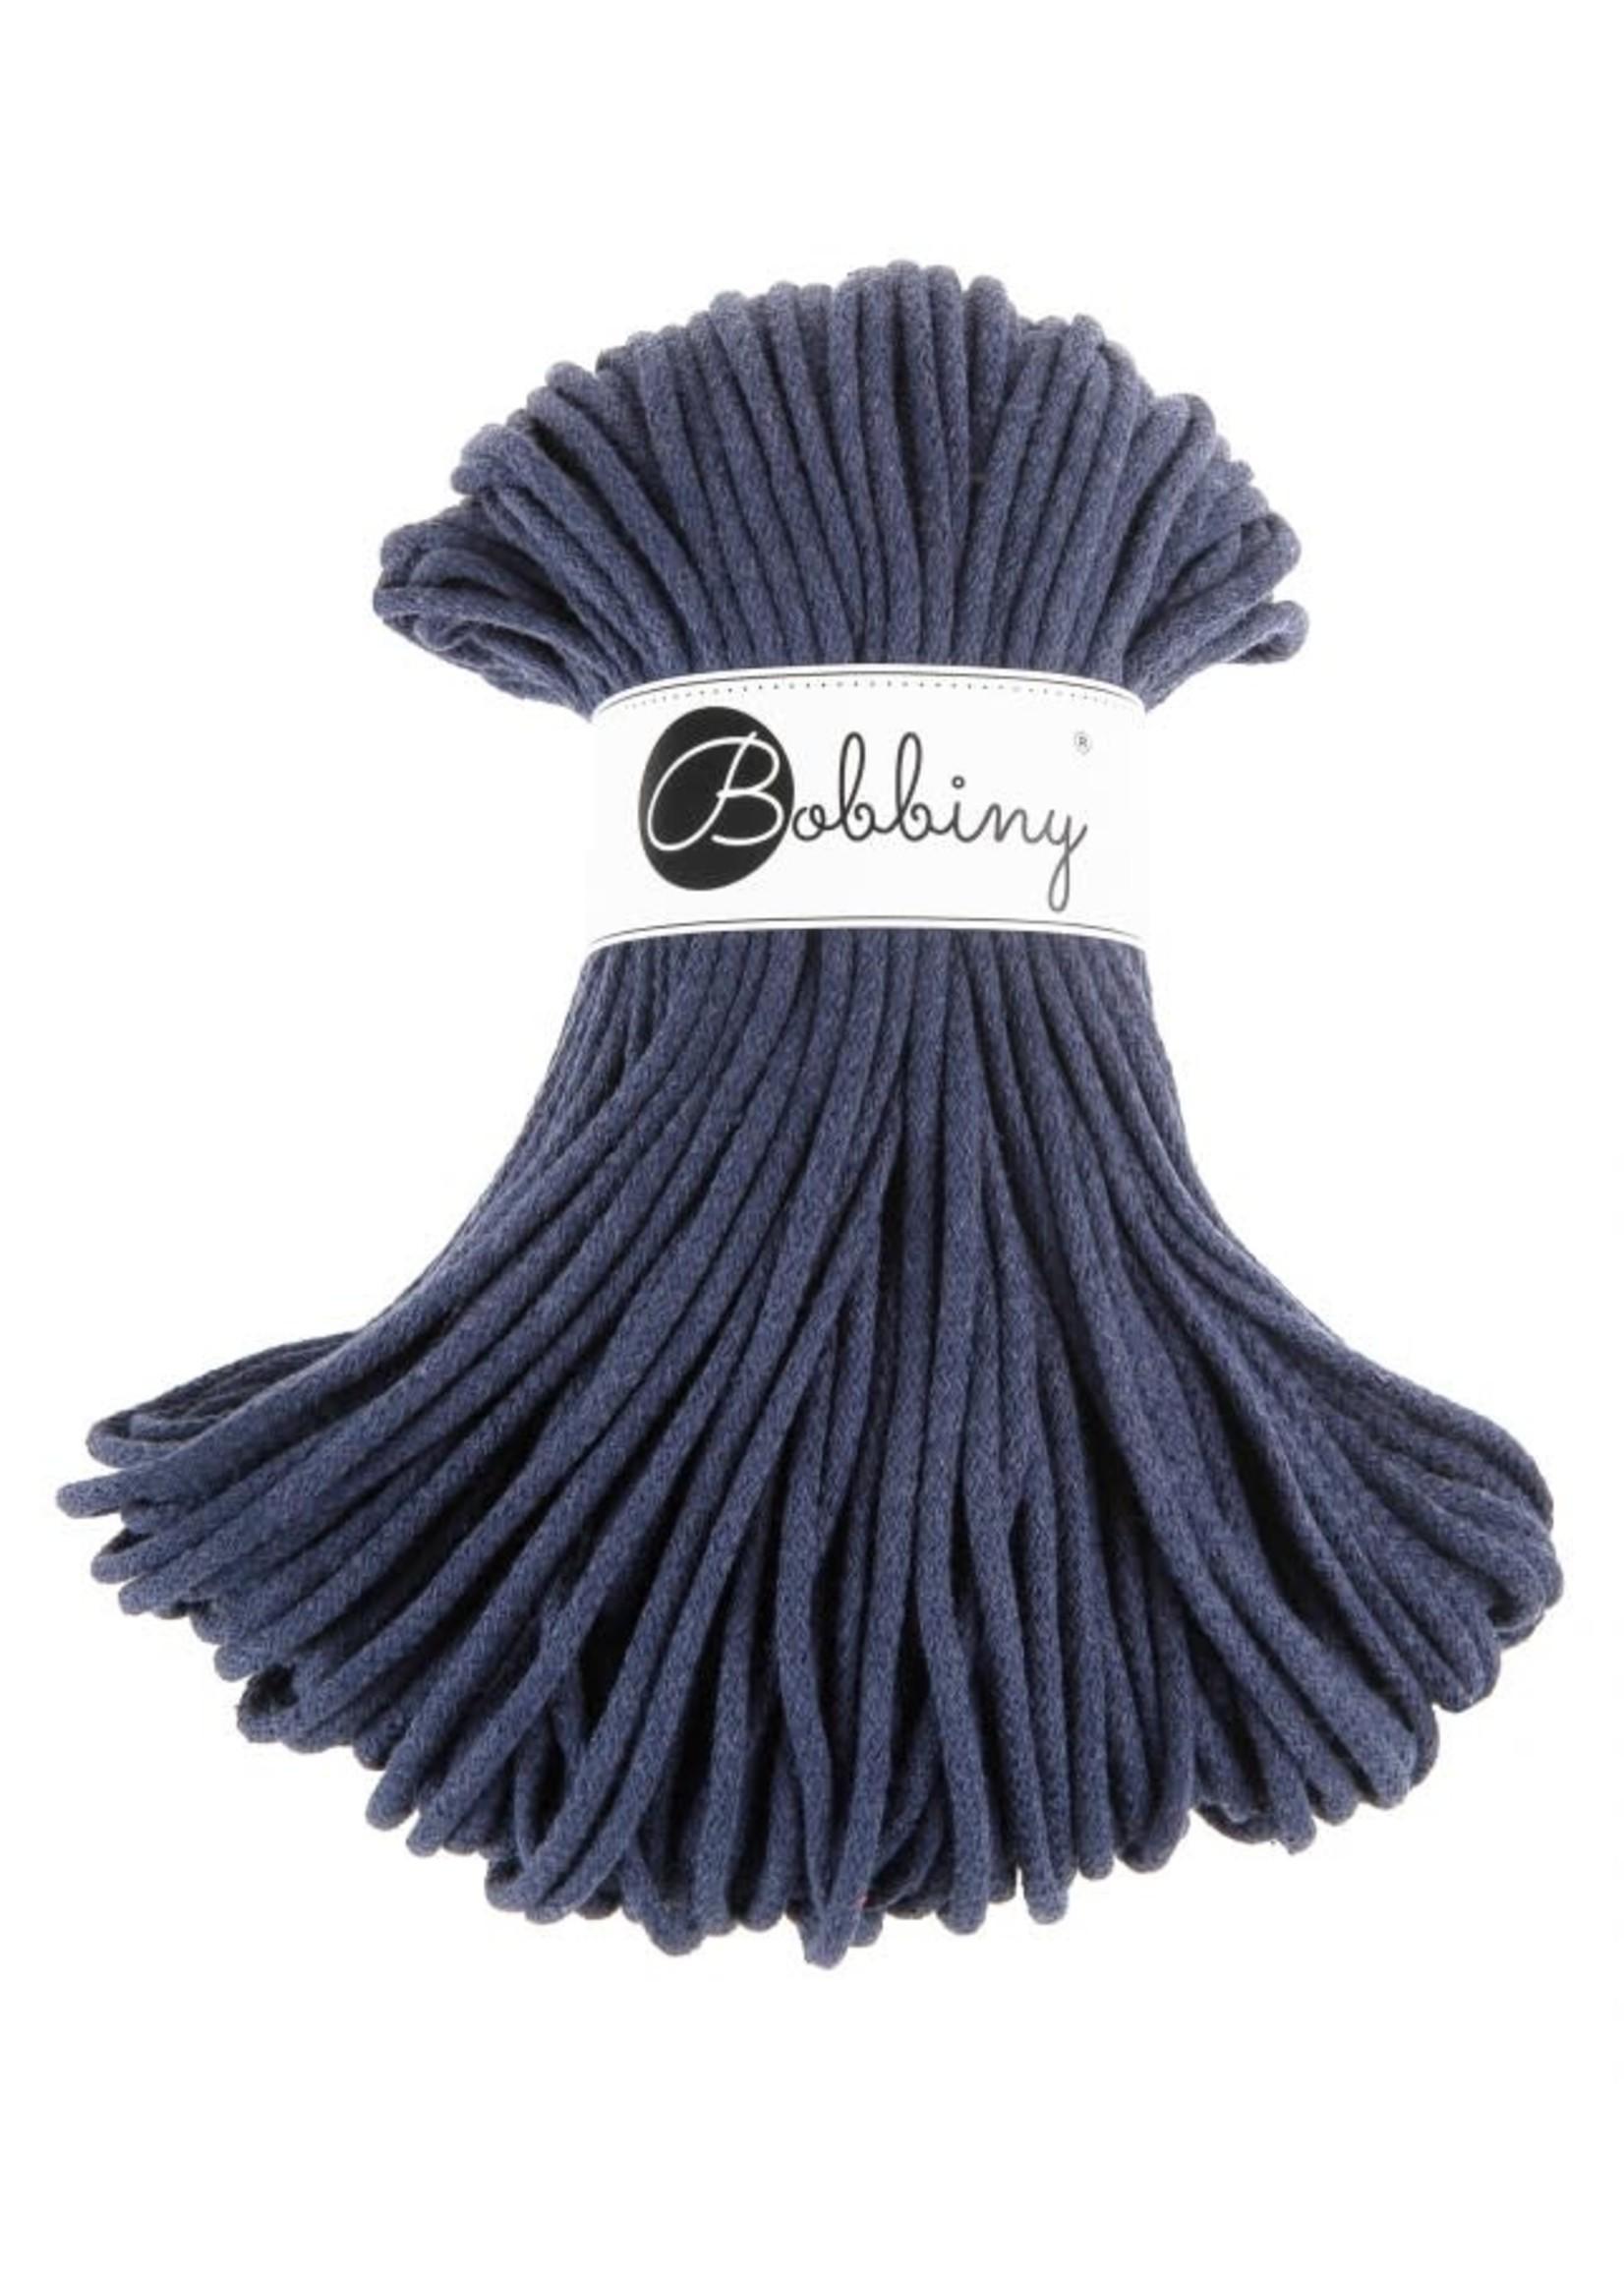 Bobbiny Bobbiny Premium - Jeans